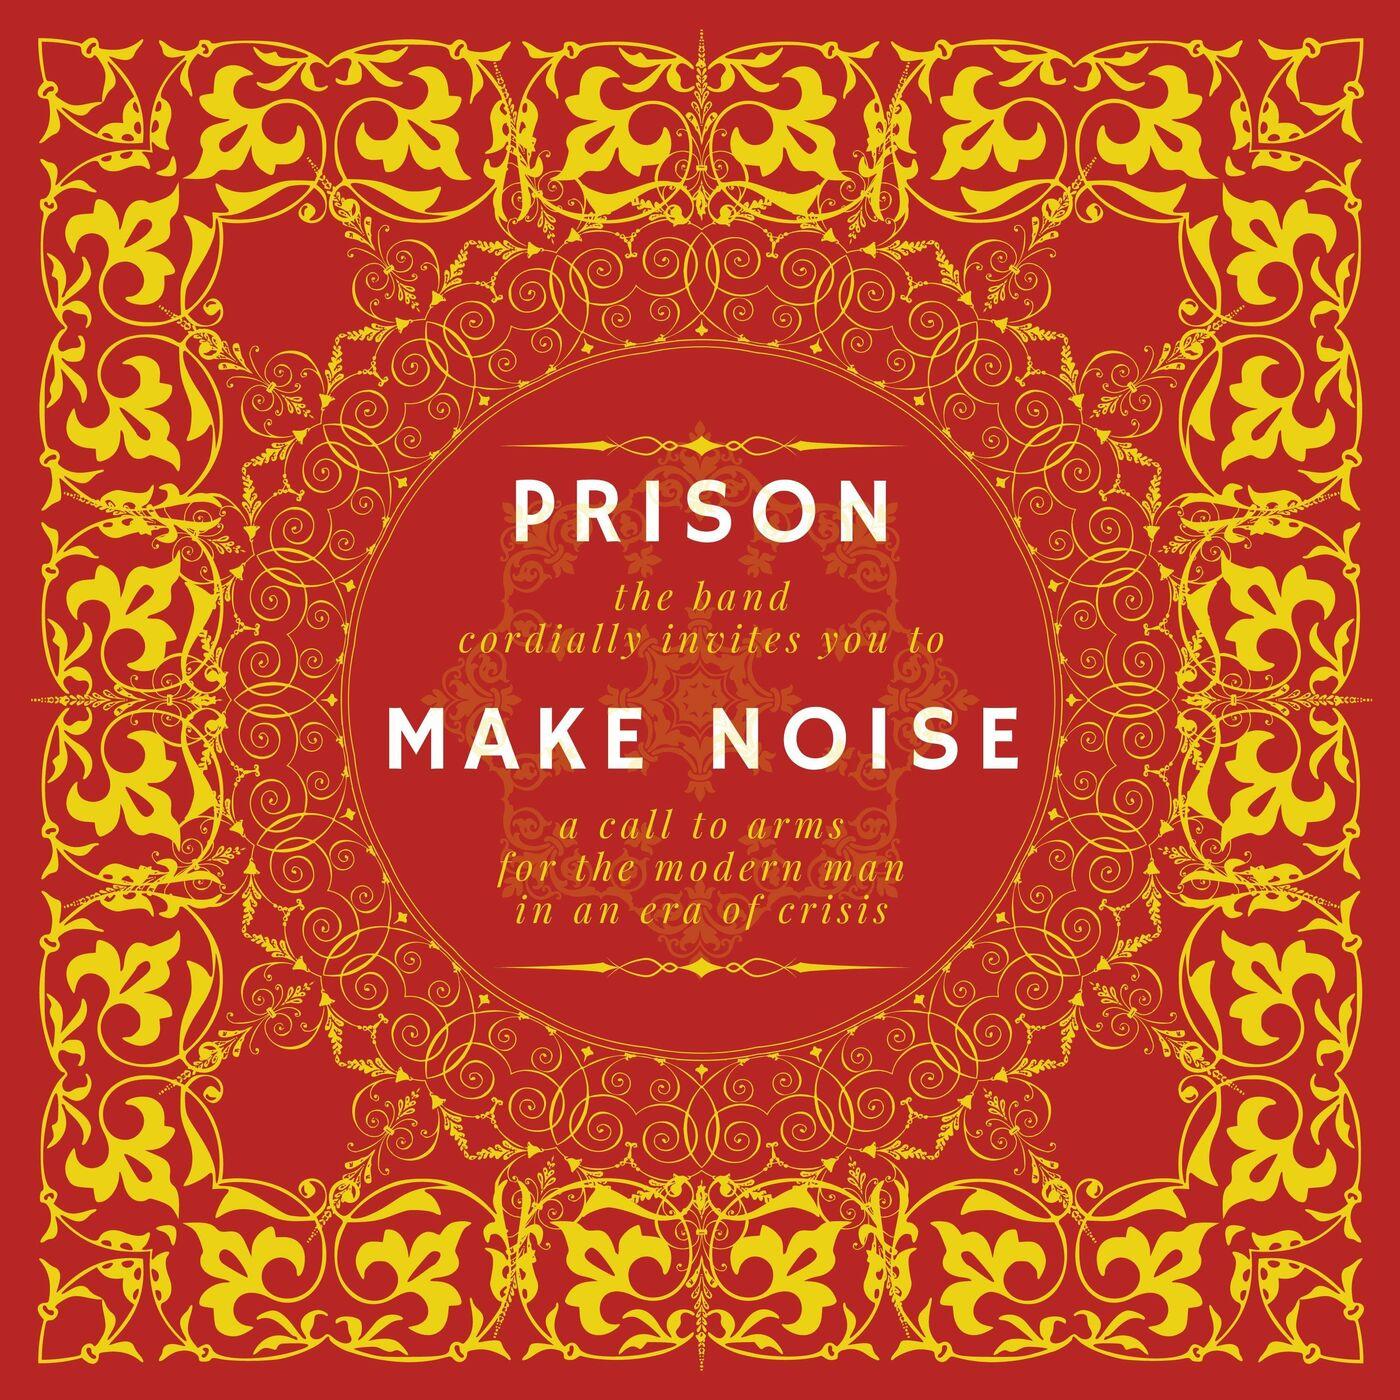 Prison - Make Noise [single] (2020)